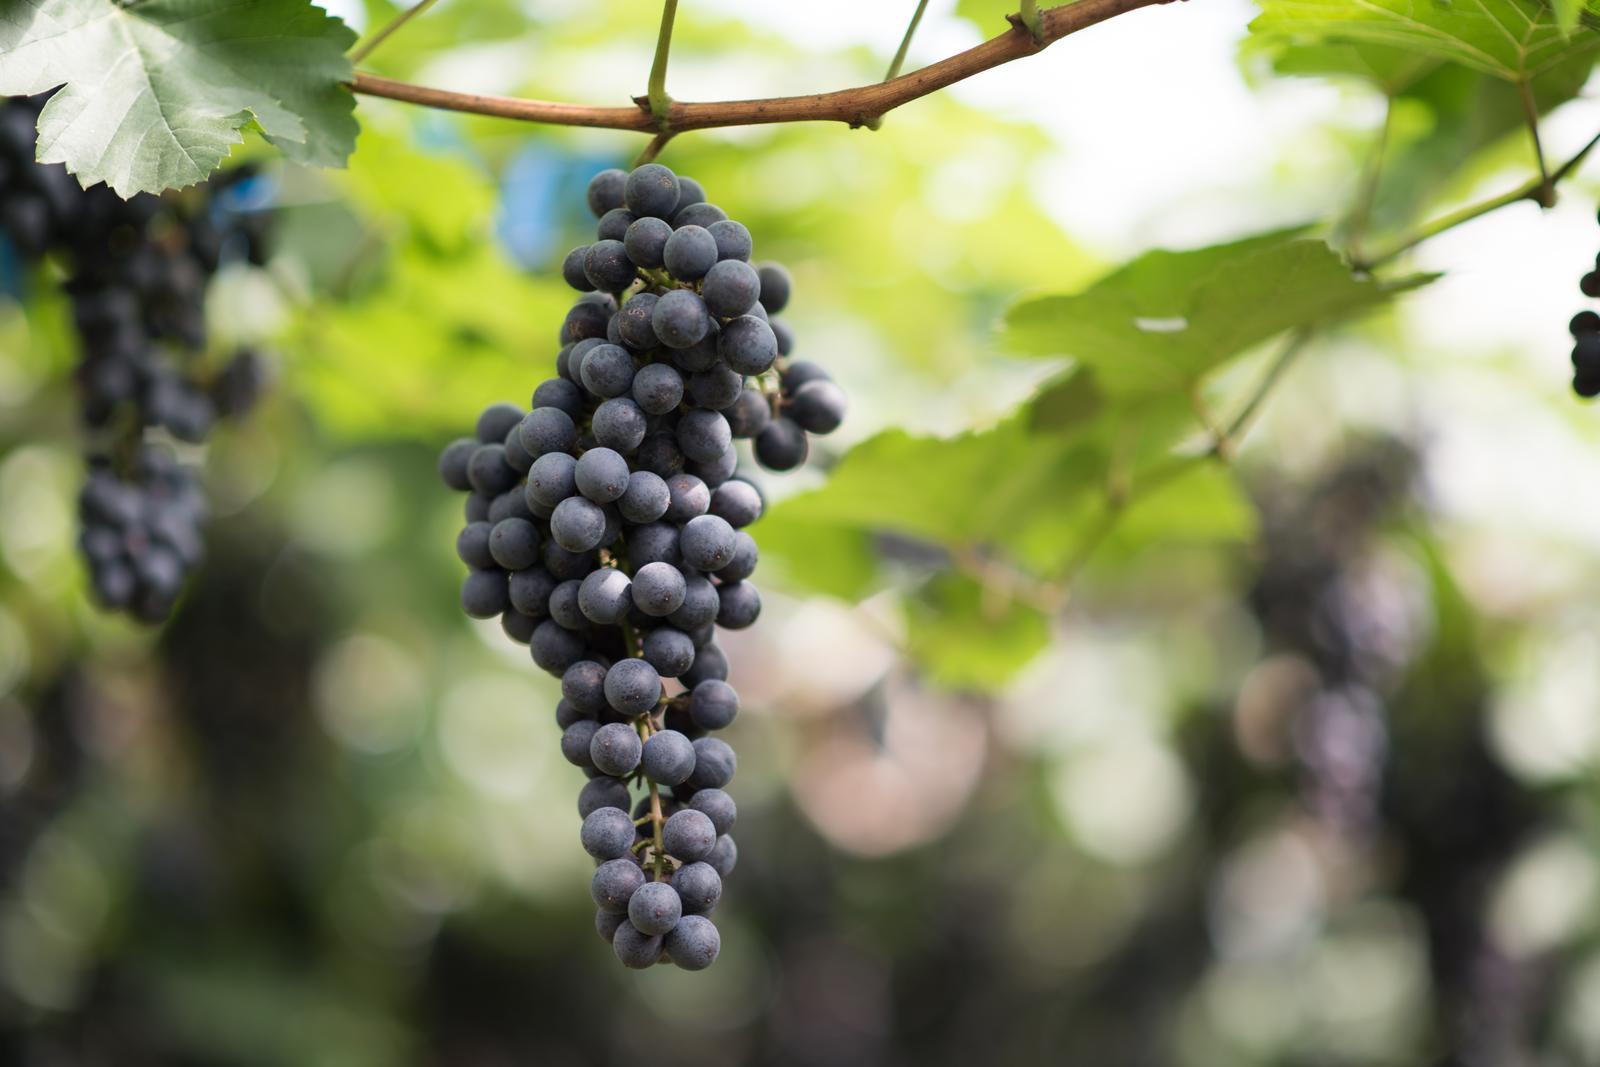 Growing of grapes in Viljandi county